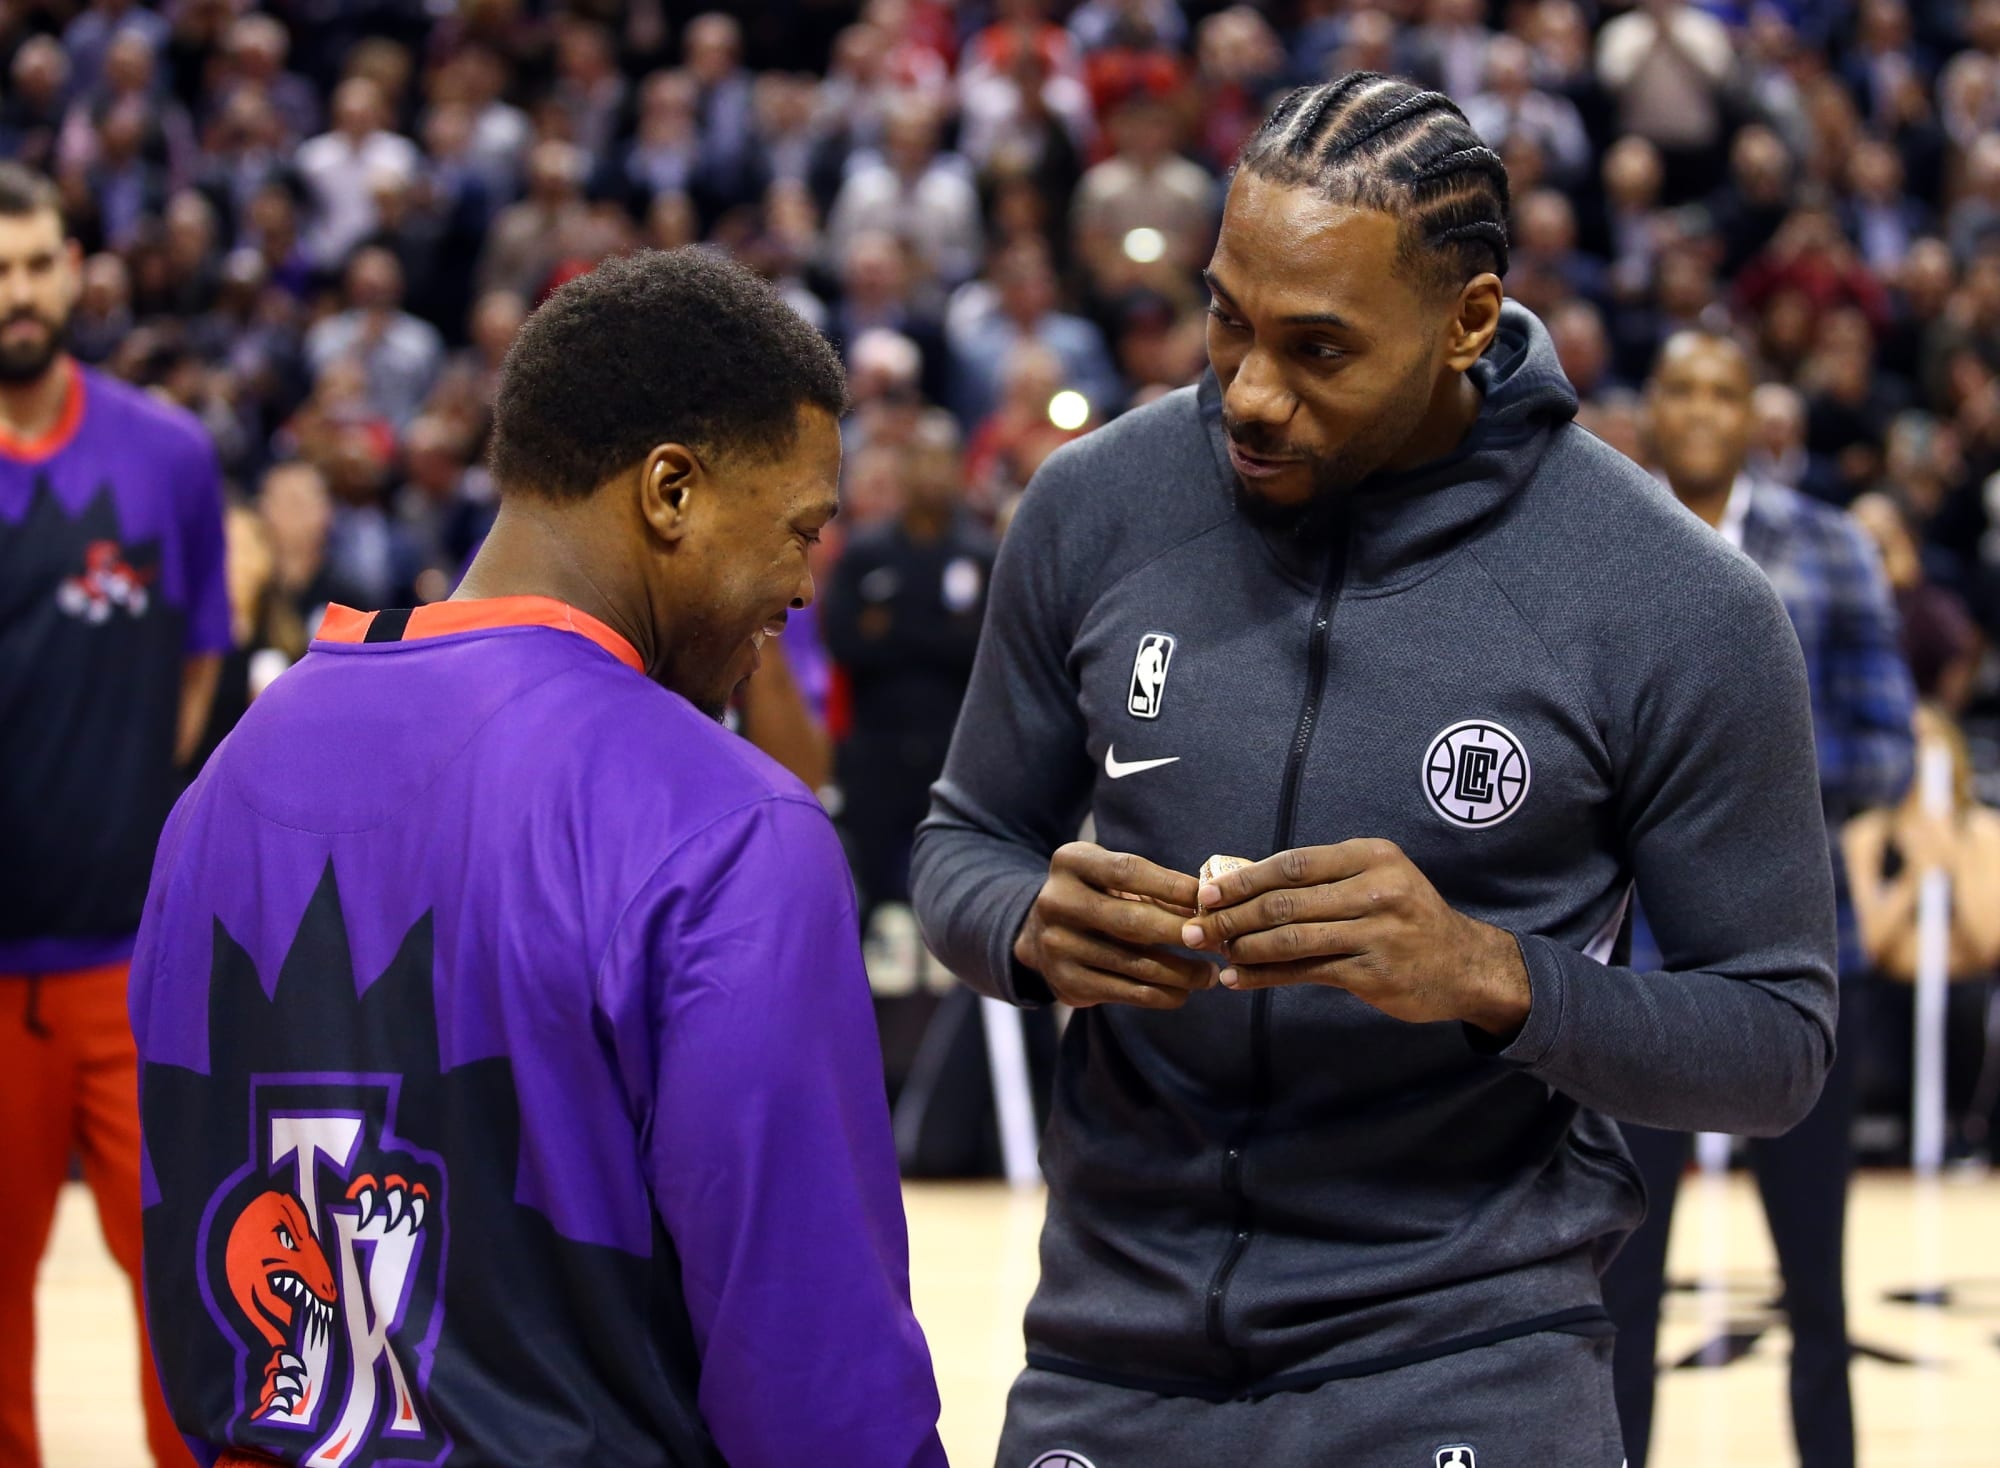 Toronto Raptors: Can NBA investigation on Kawhi Leonard return him to Toronto?